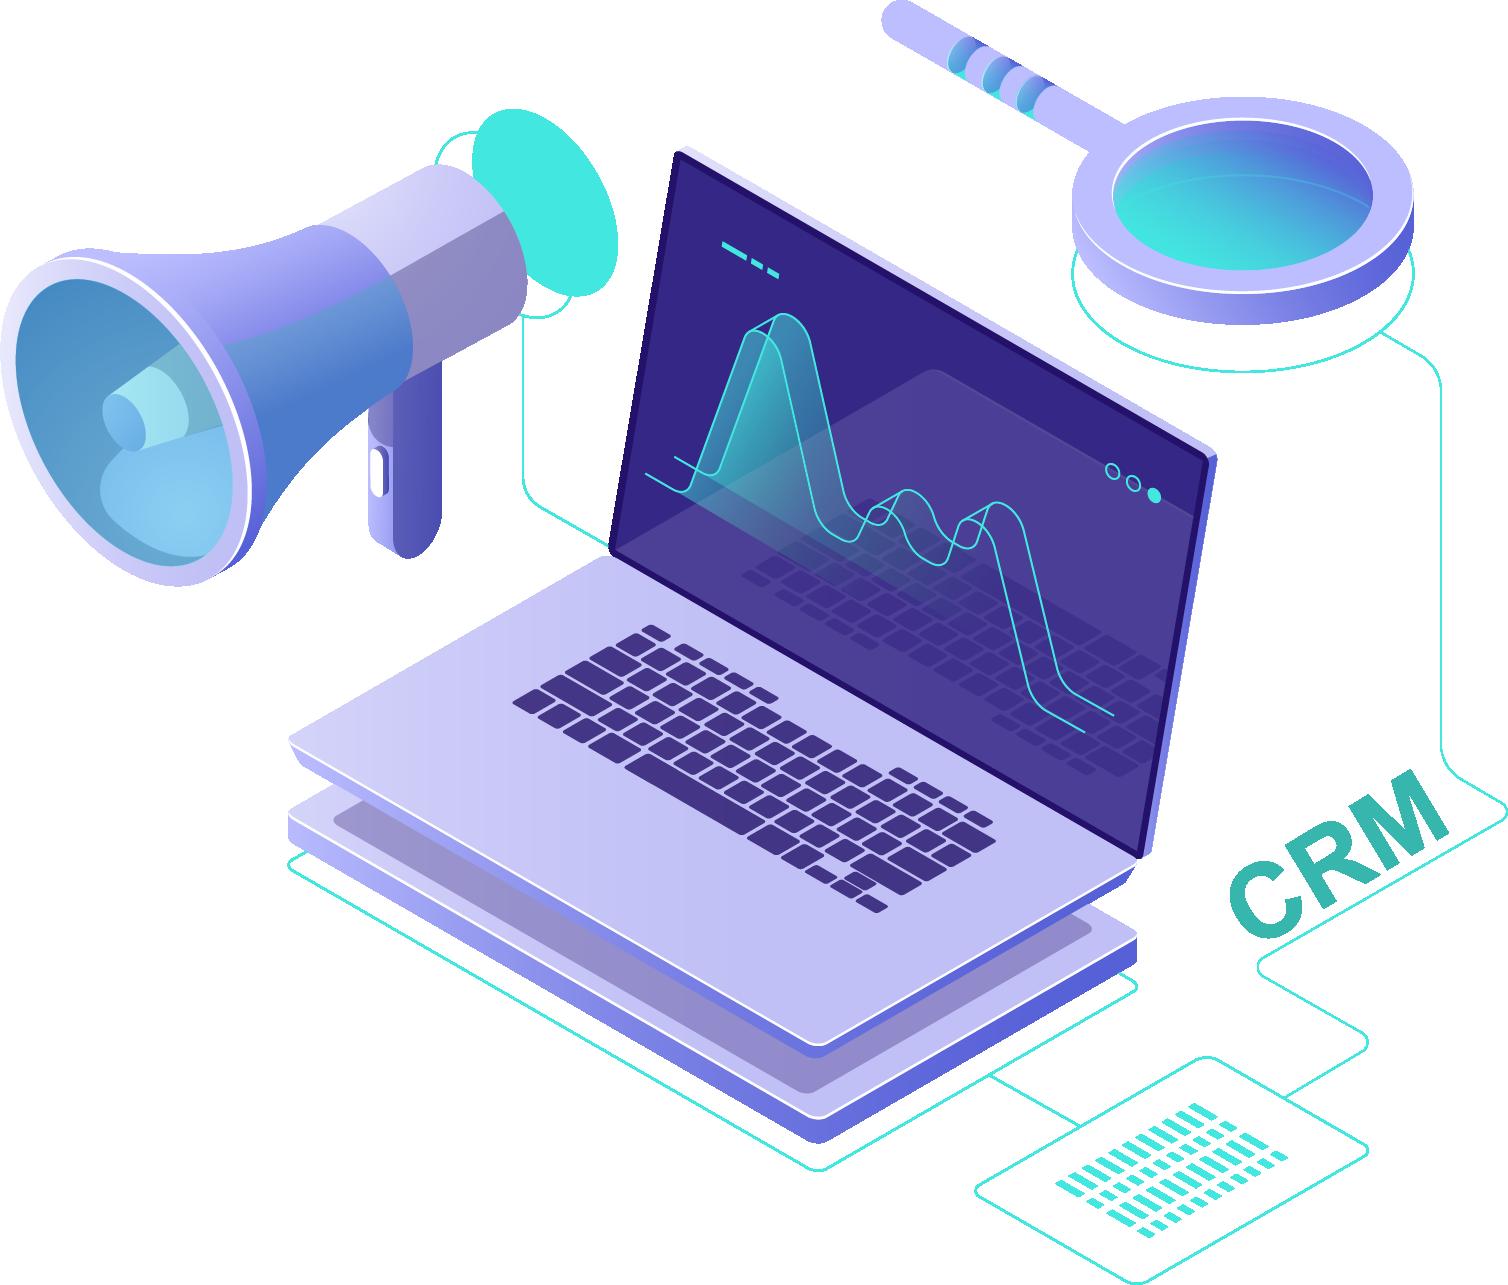 CRM Datenschutz